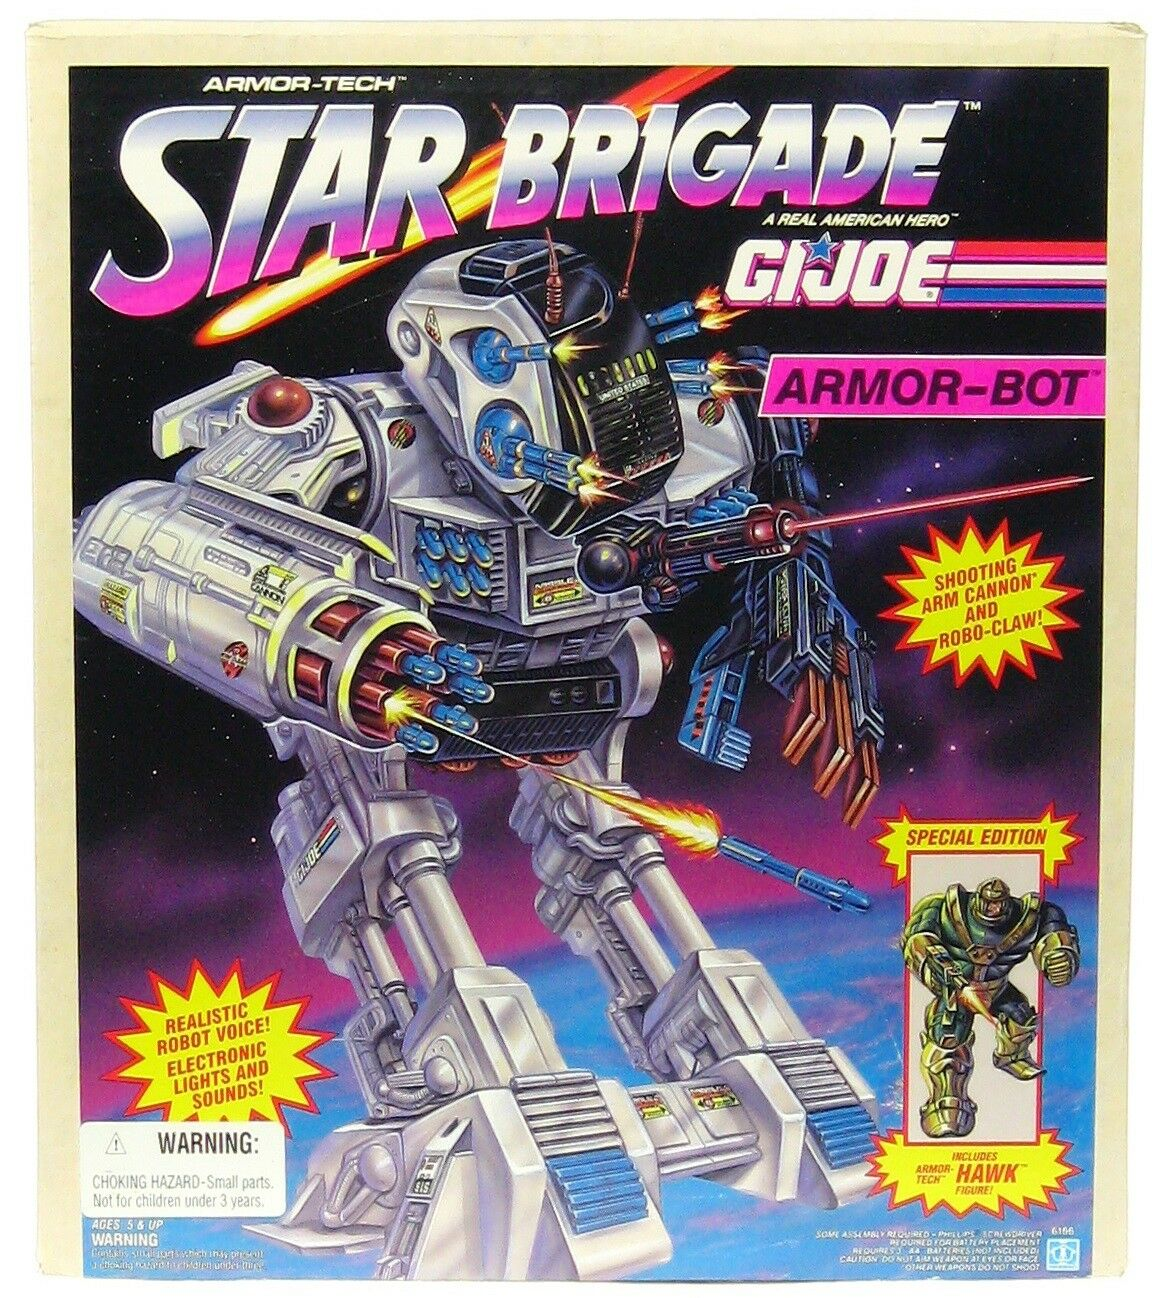 Vintage hasbro gi joe star brigade elektronische rüstung bot - fabrik versiegelt misb